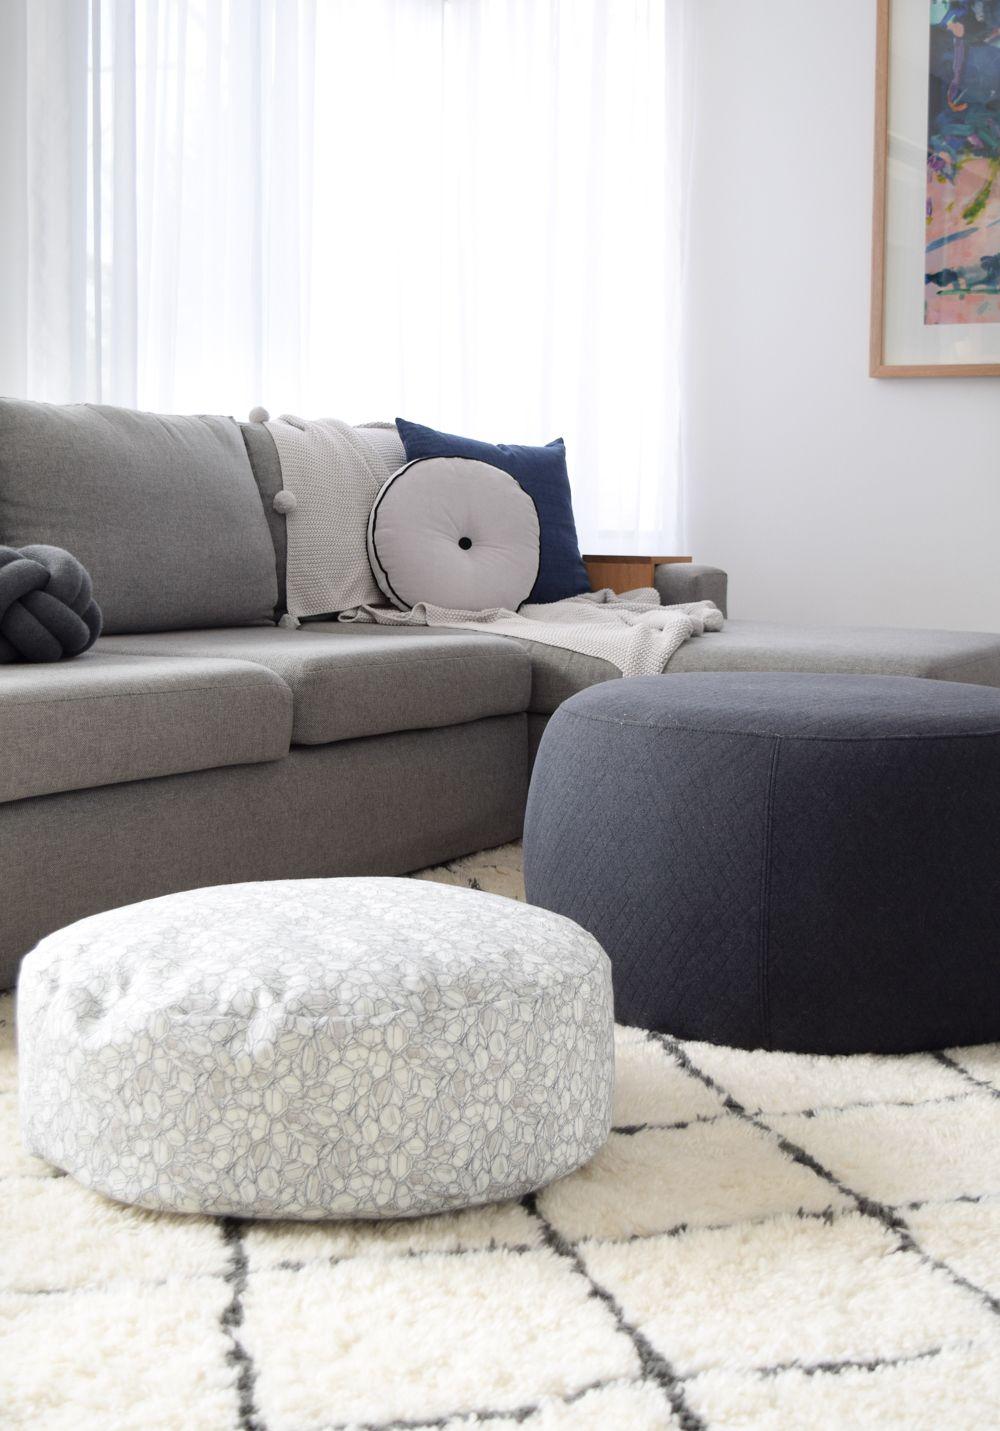 Kmart hack kids cushion turns luxe floor cushion Style